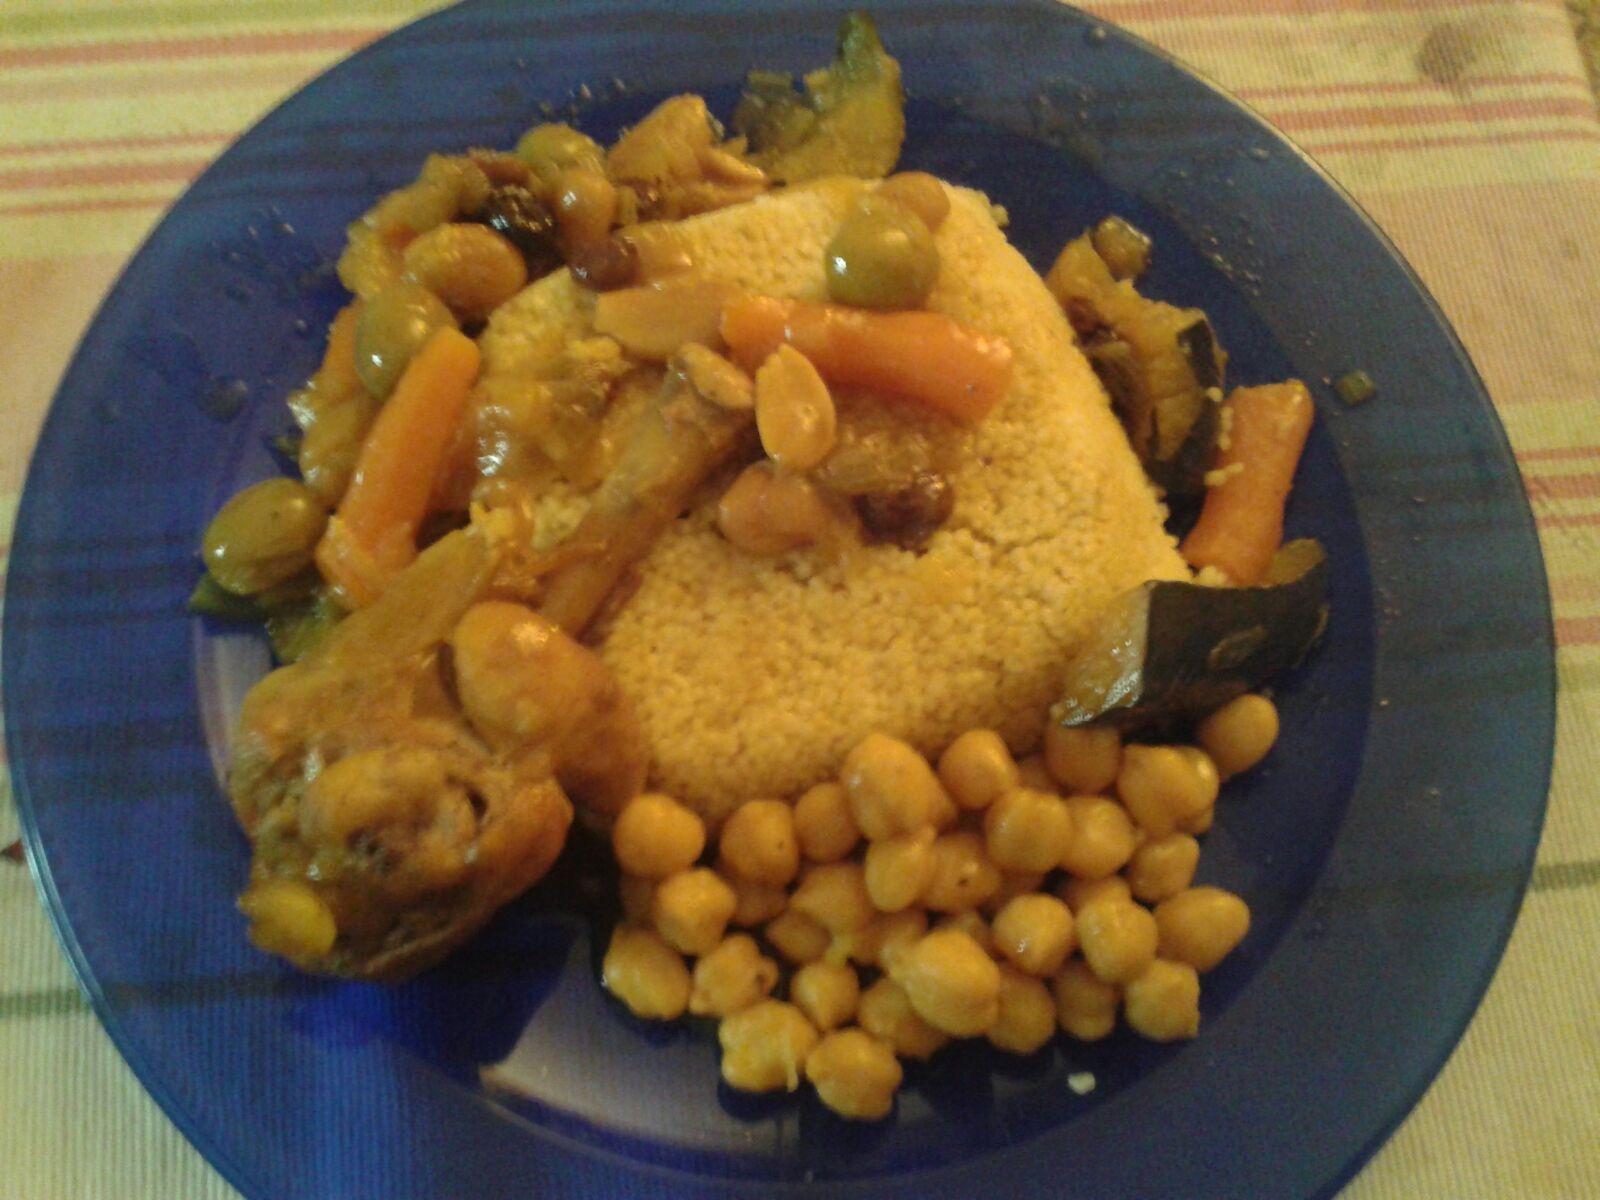 Cous Cous Con Verdura y Pollo